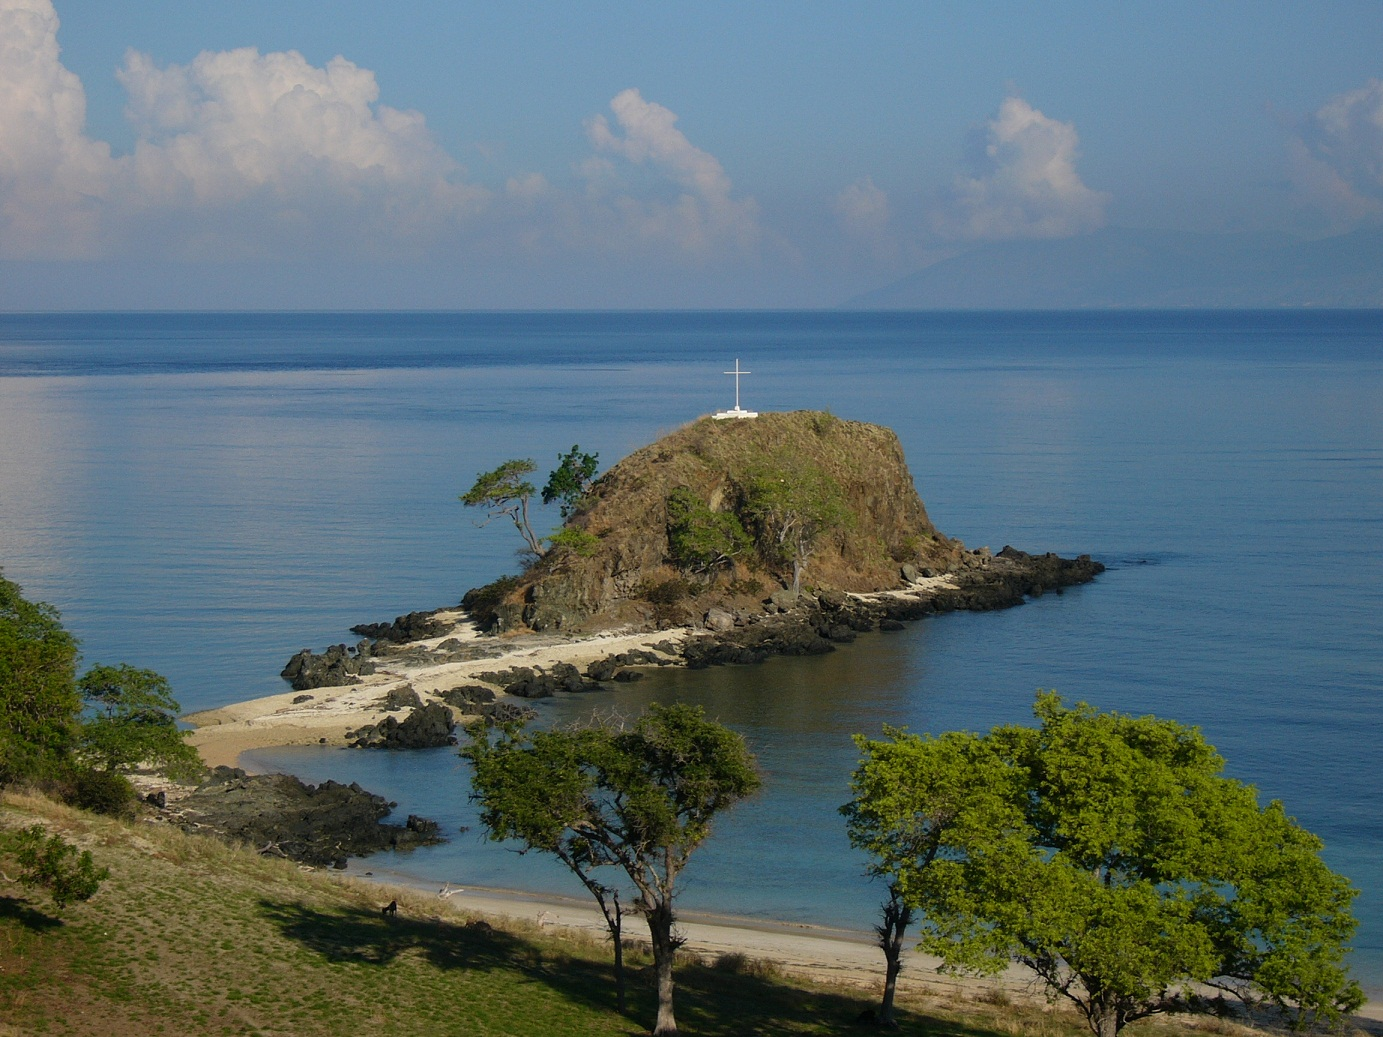 Metinaro | Timor Leste